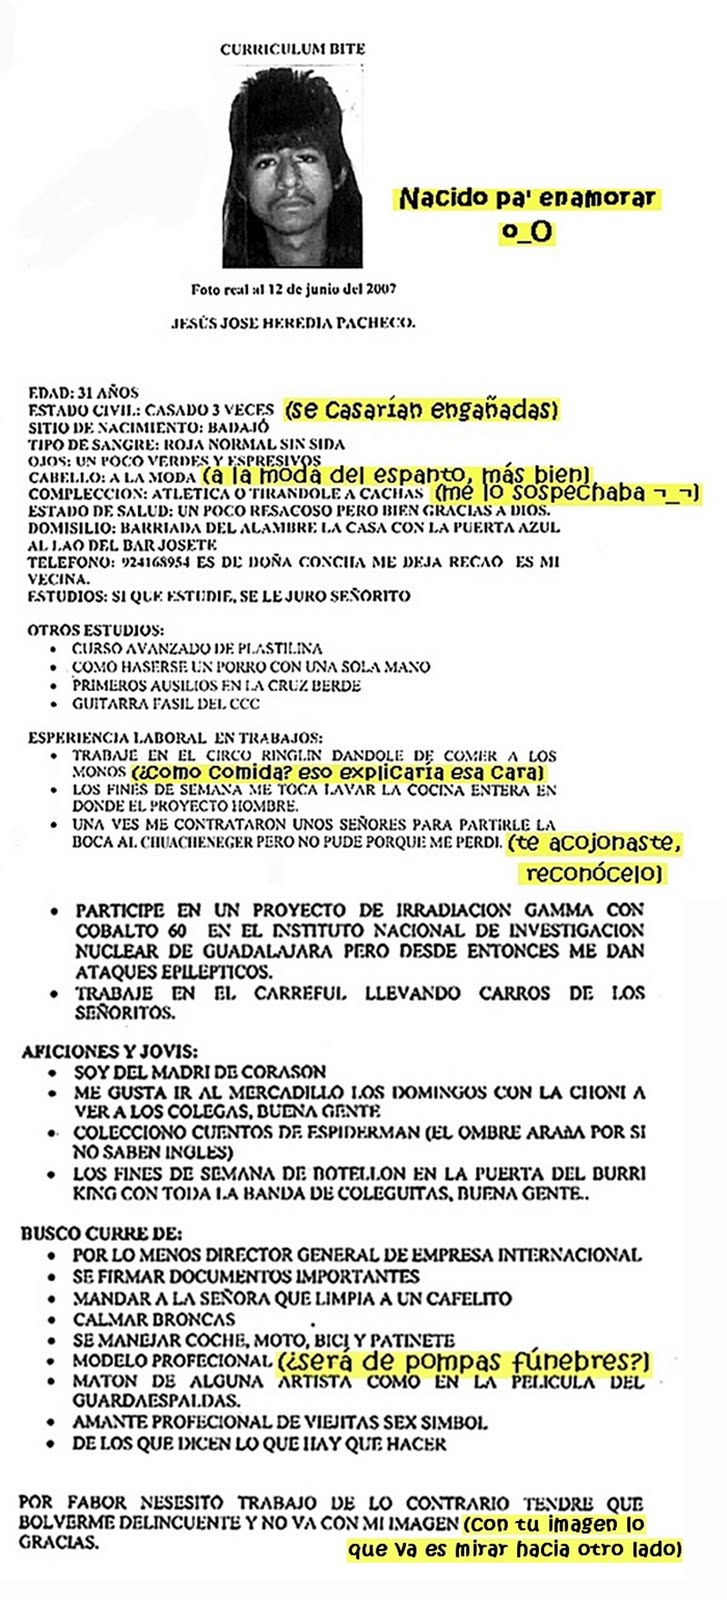 DIARIO de un YOGUR Caducado.: Curriculum vitae.